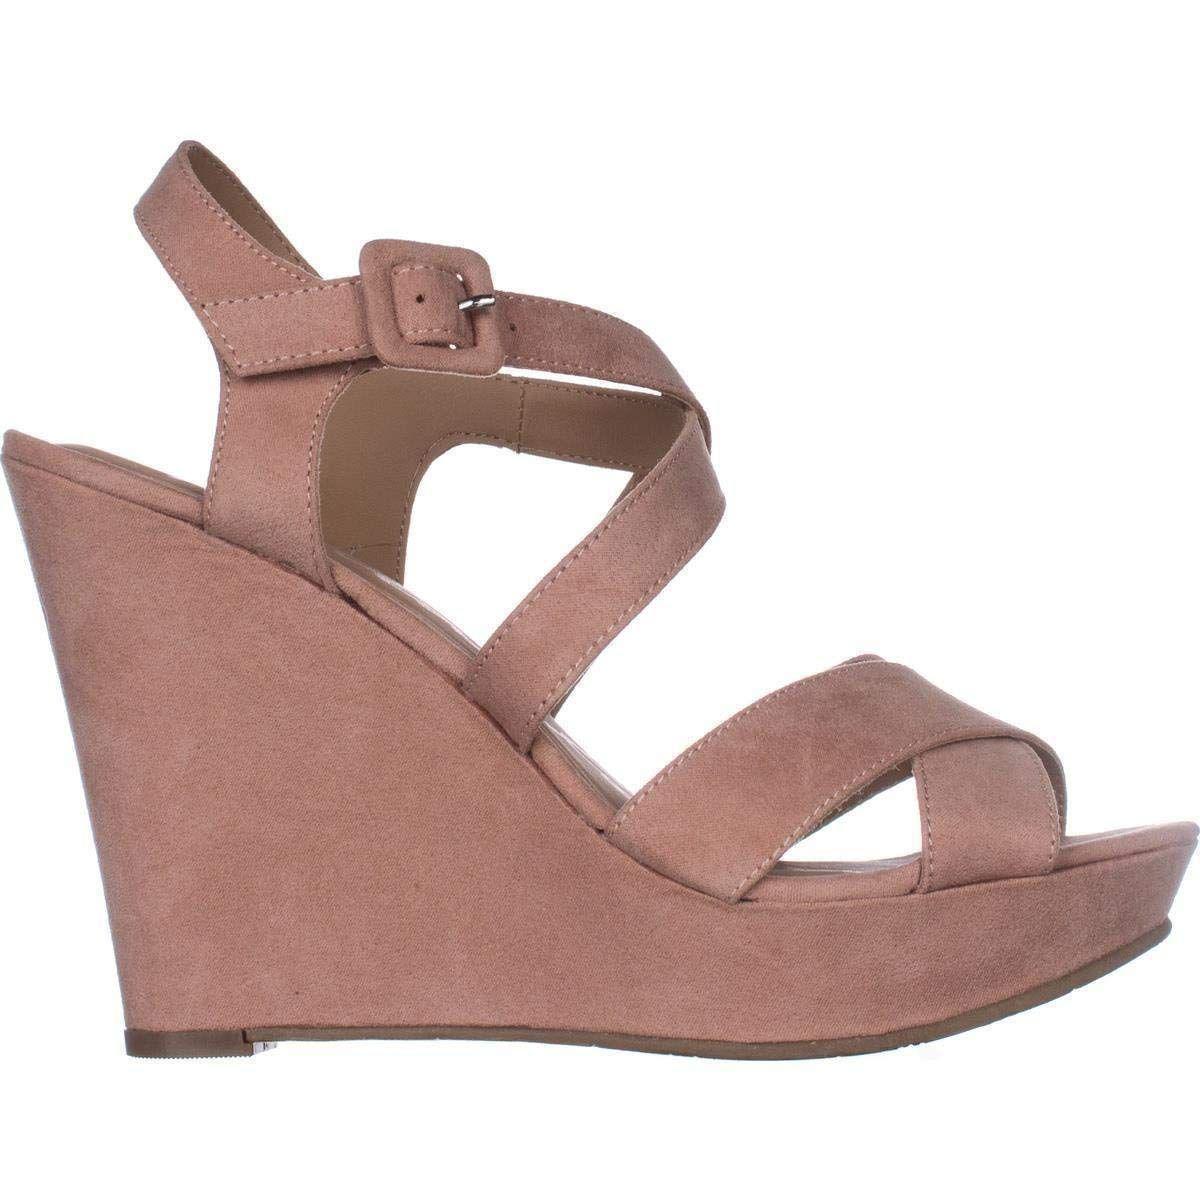 b0204b72332 American Rag - Brown Womens Rachey Peep Toe Casual Platform Sandals - Lyst.  View fullscreen